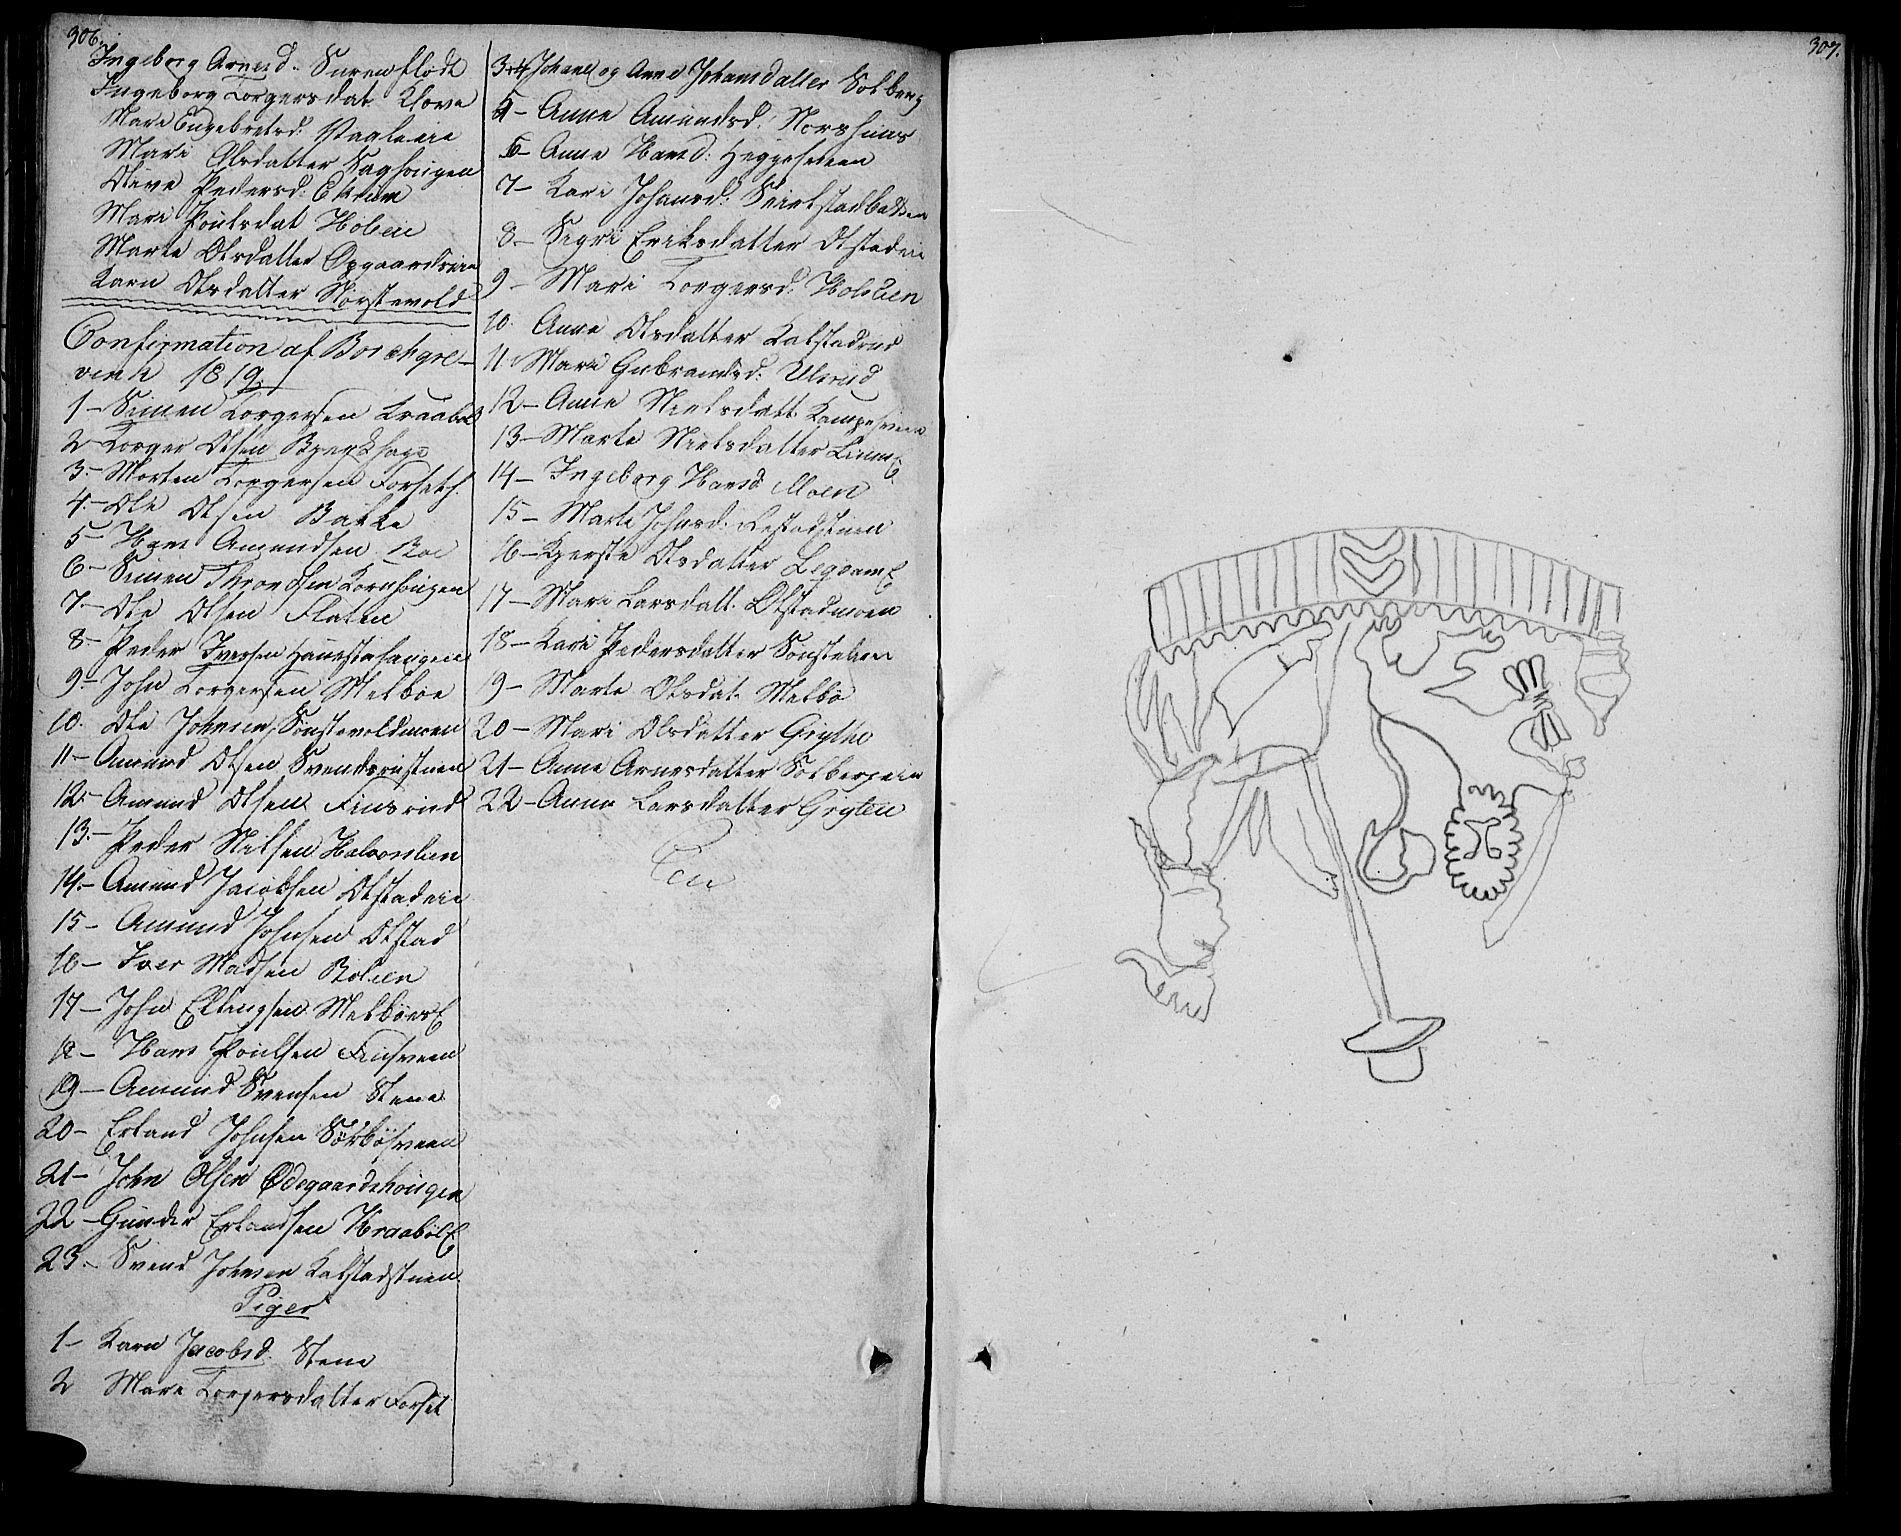 SAH, Gausdal prestekontor, Ministerialbok nr. 4, 1809-1817, s. 306-307